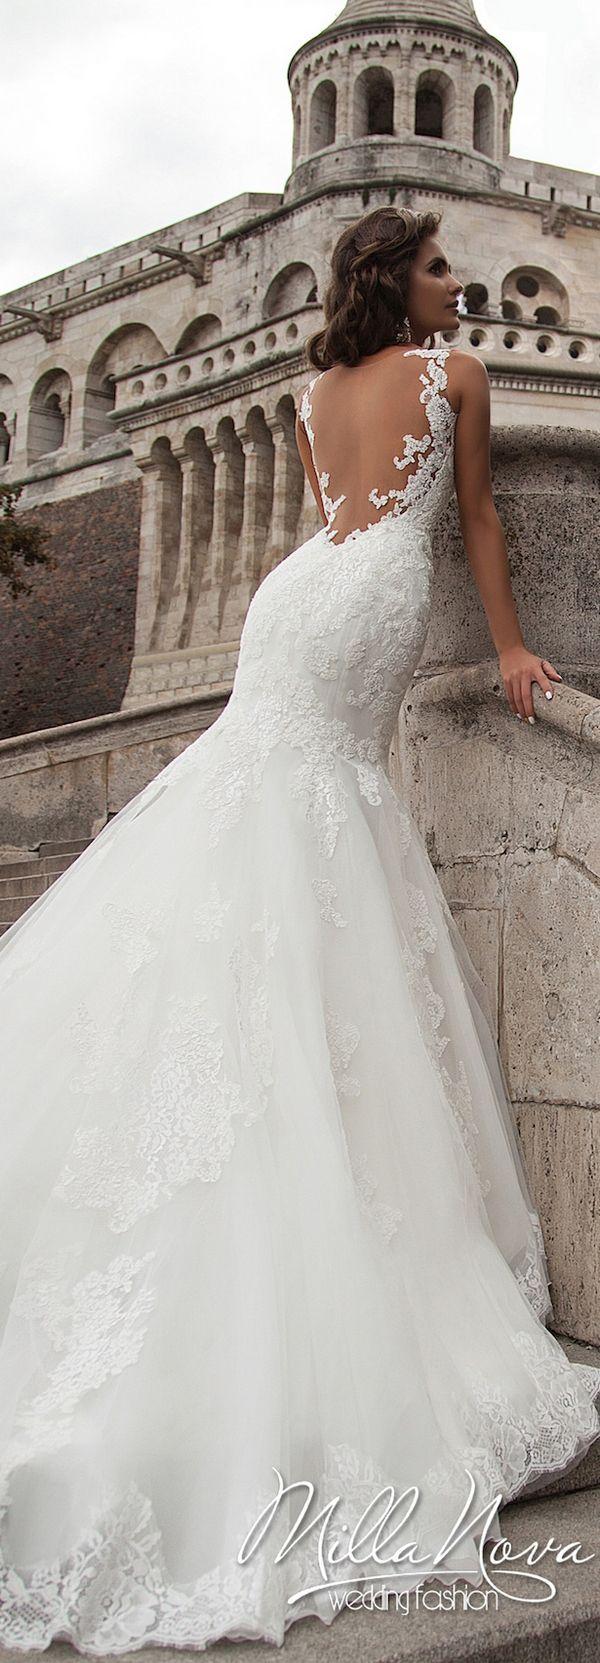 best tt wedding dresses images on pinterest wedding frocks